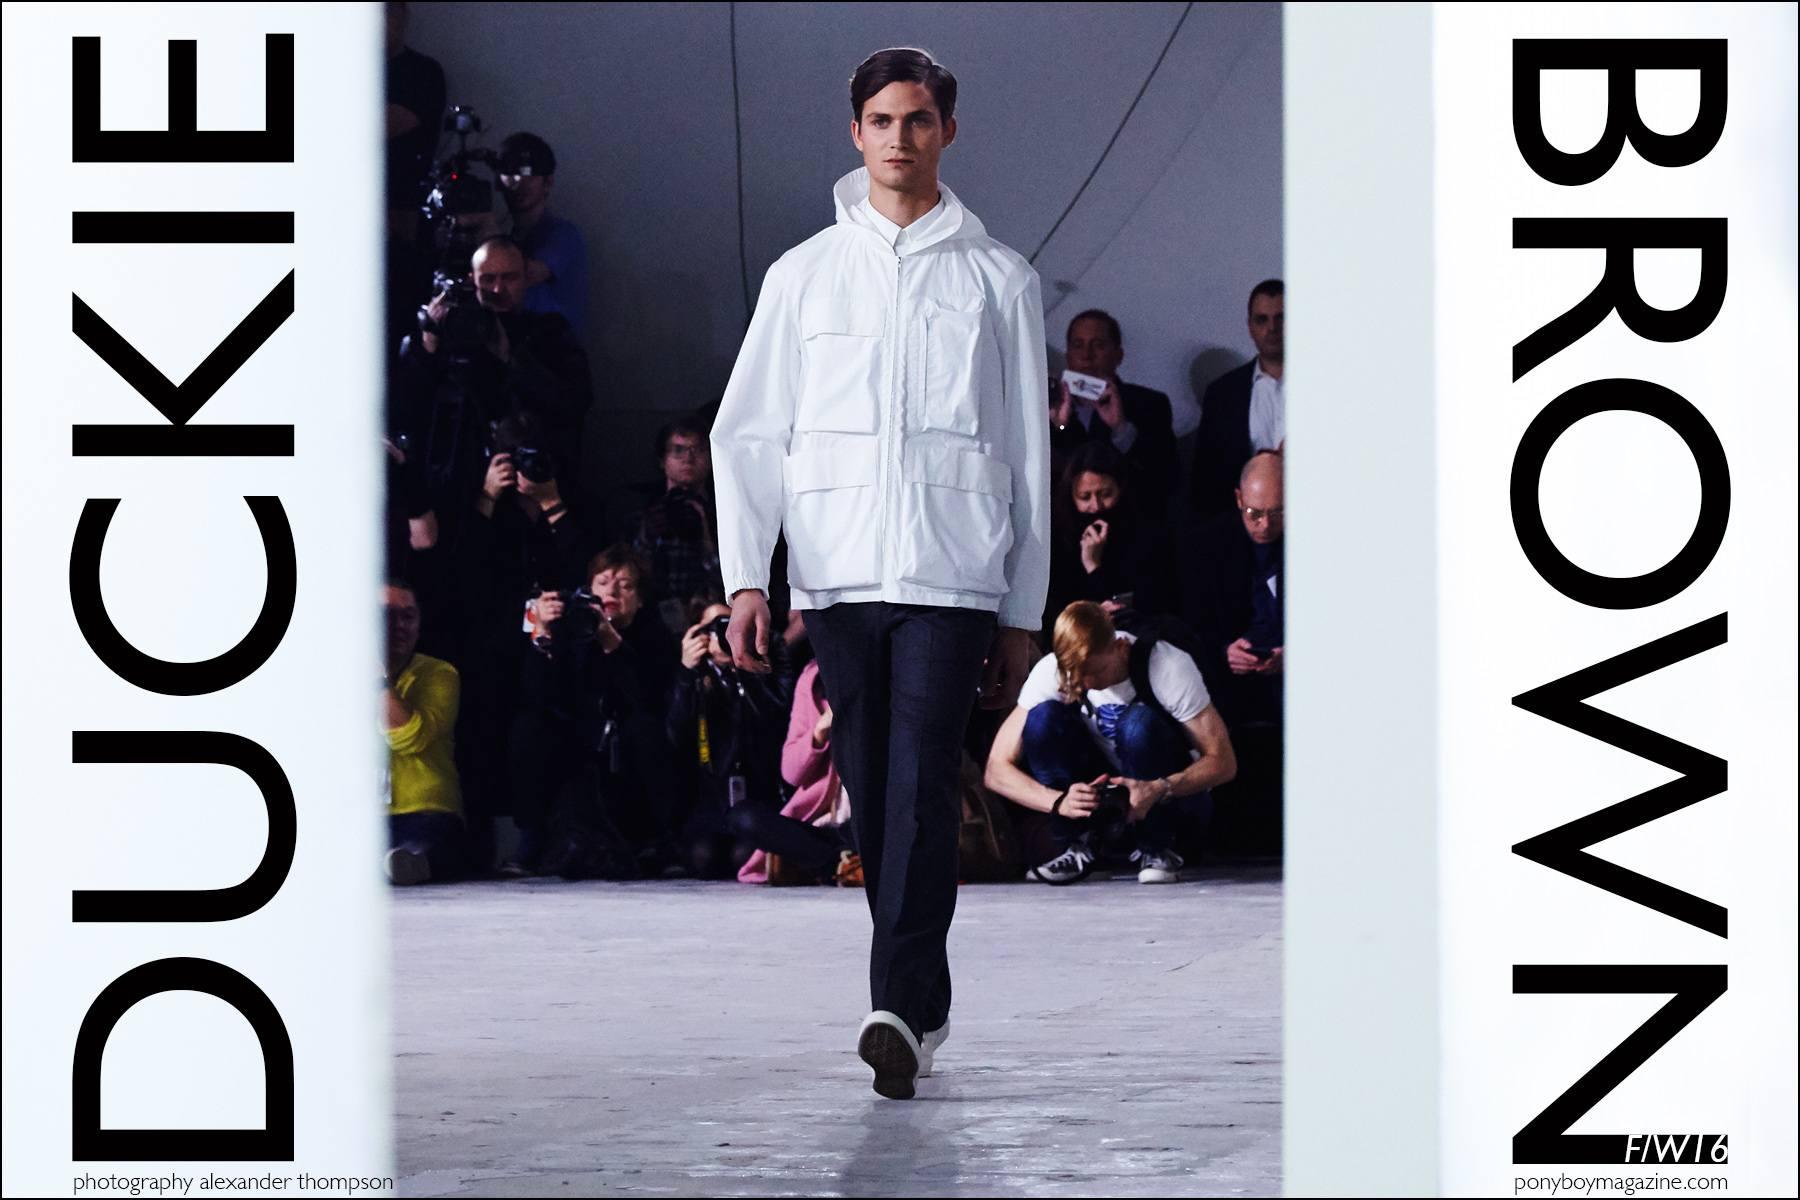 Male model Paul-Alexandre Haubtmann walks for Duckie Brown F/W16 menswear. Photography by Alexander Thompson for Ponyboy magazine NY.